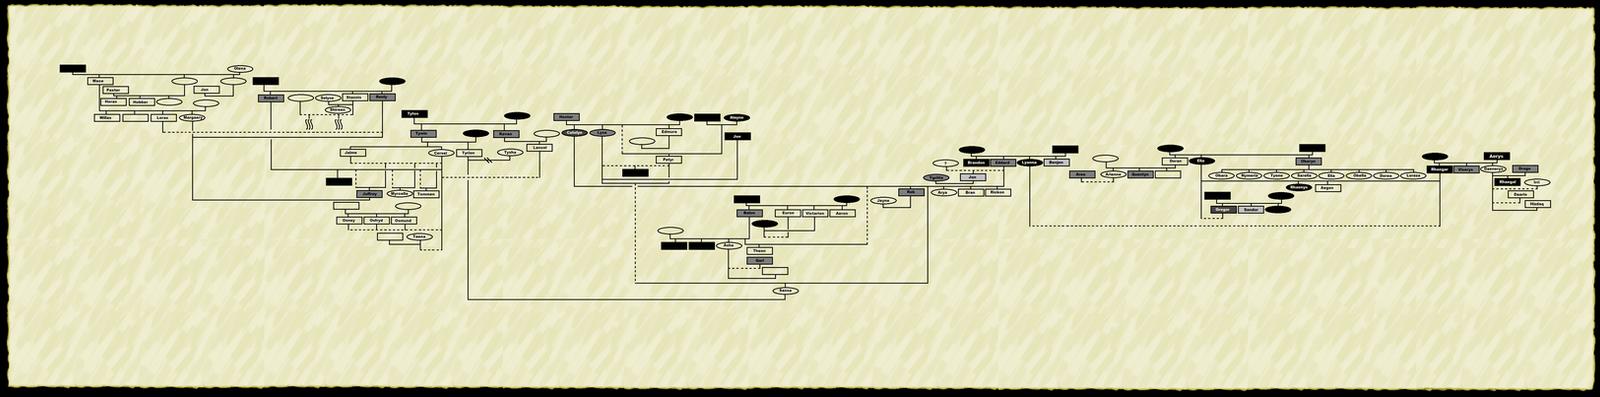 asoiaf family tree by fallsapart